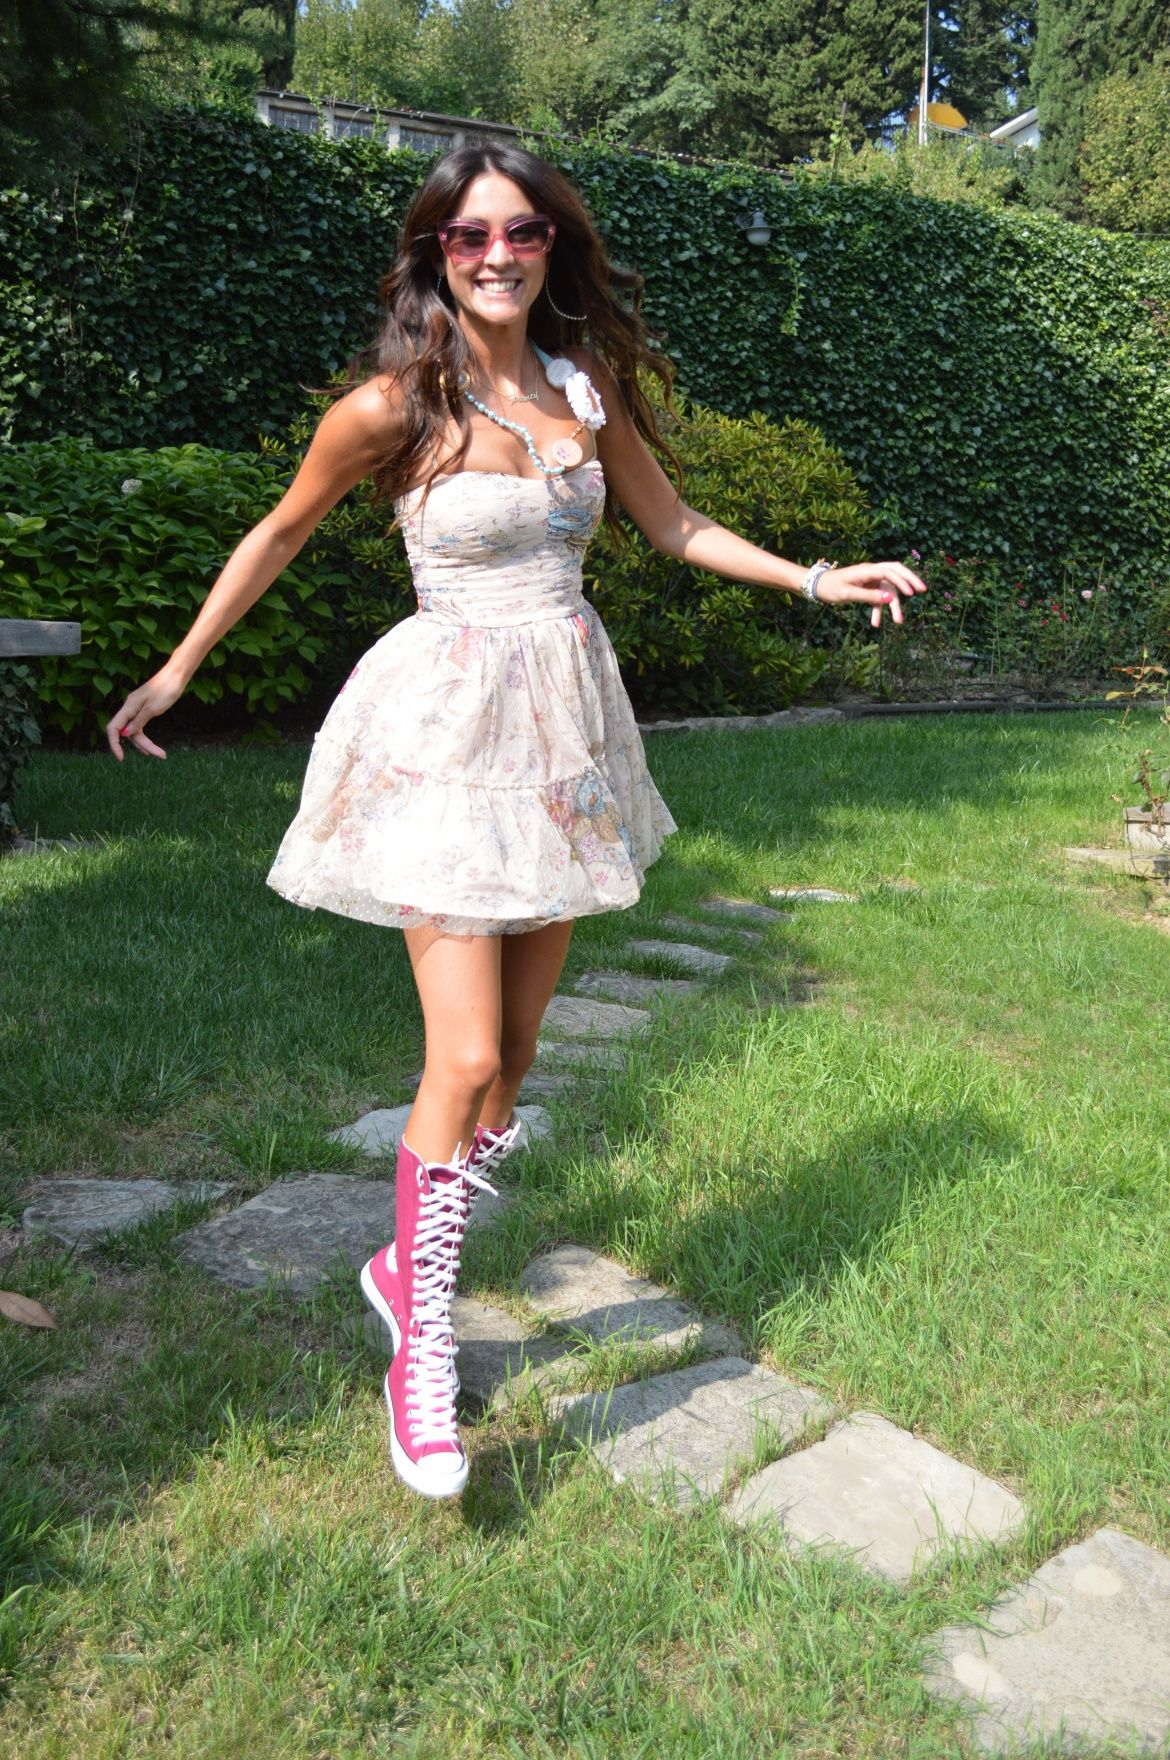 df25bbb11229 xxhi knee high converse converse boots tall converse girl pink ...